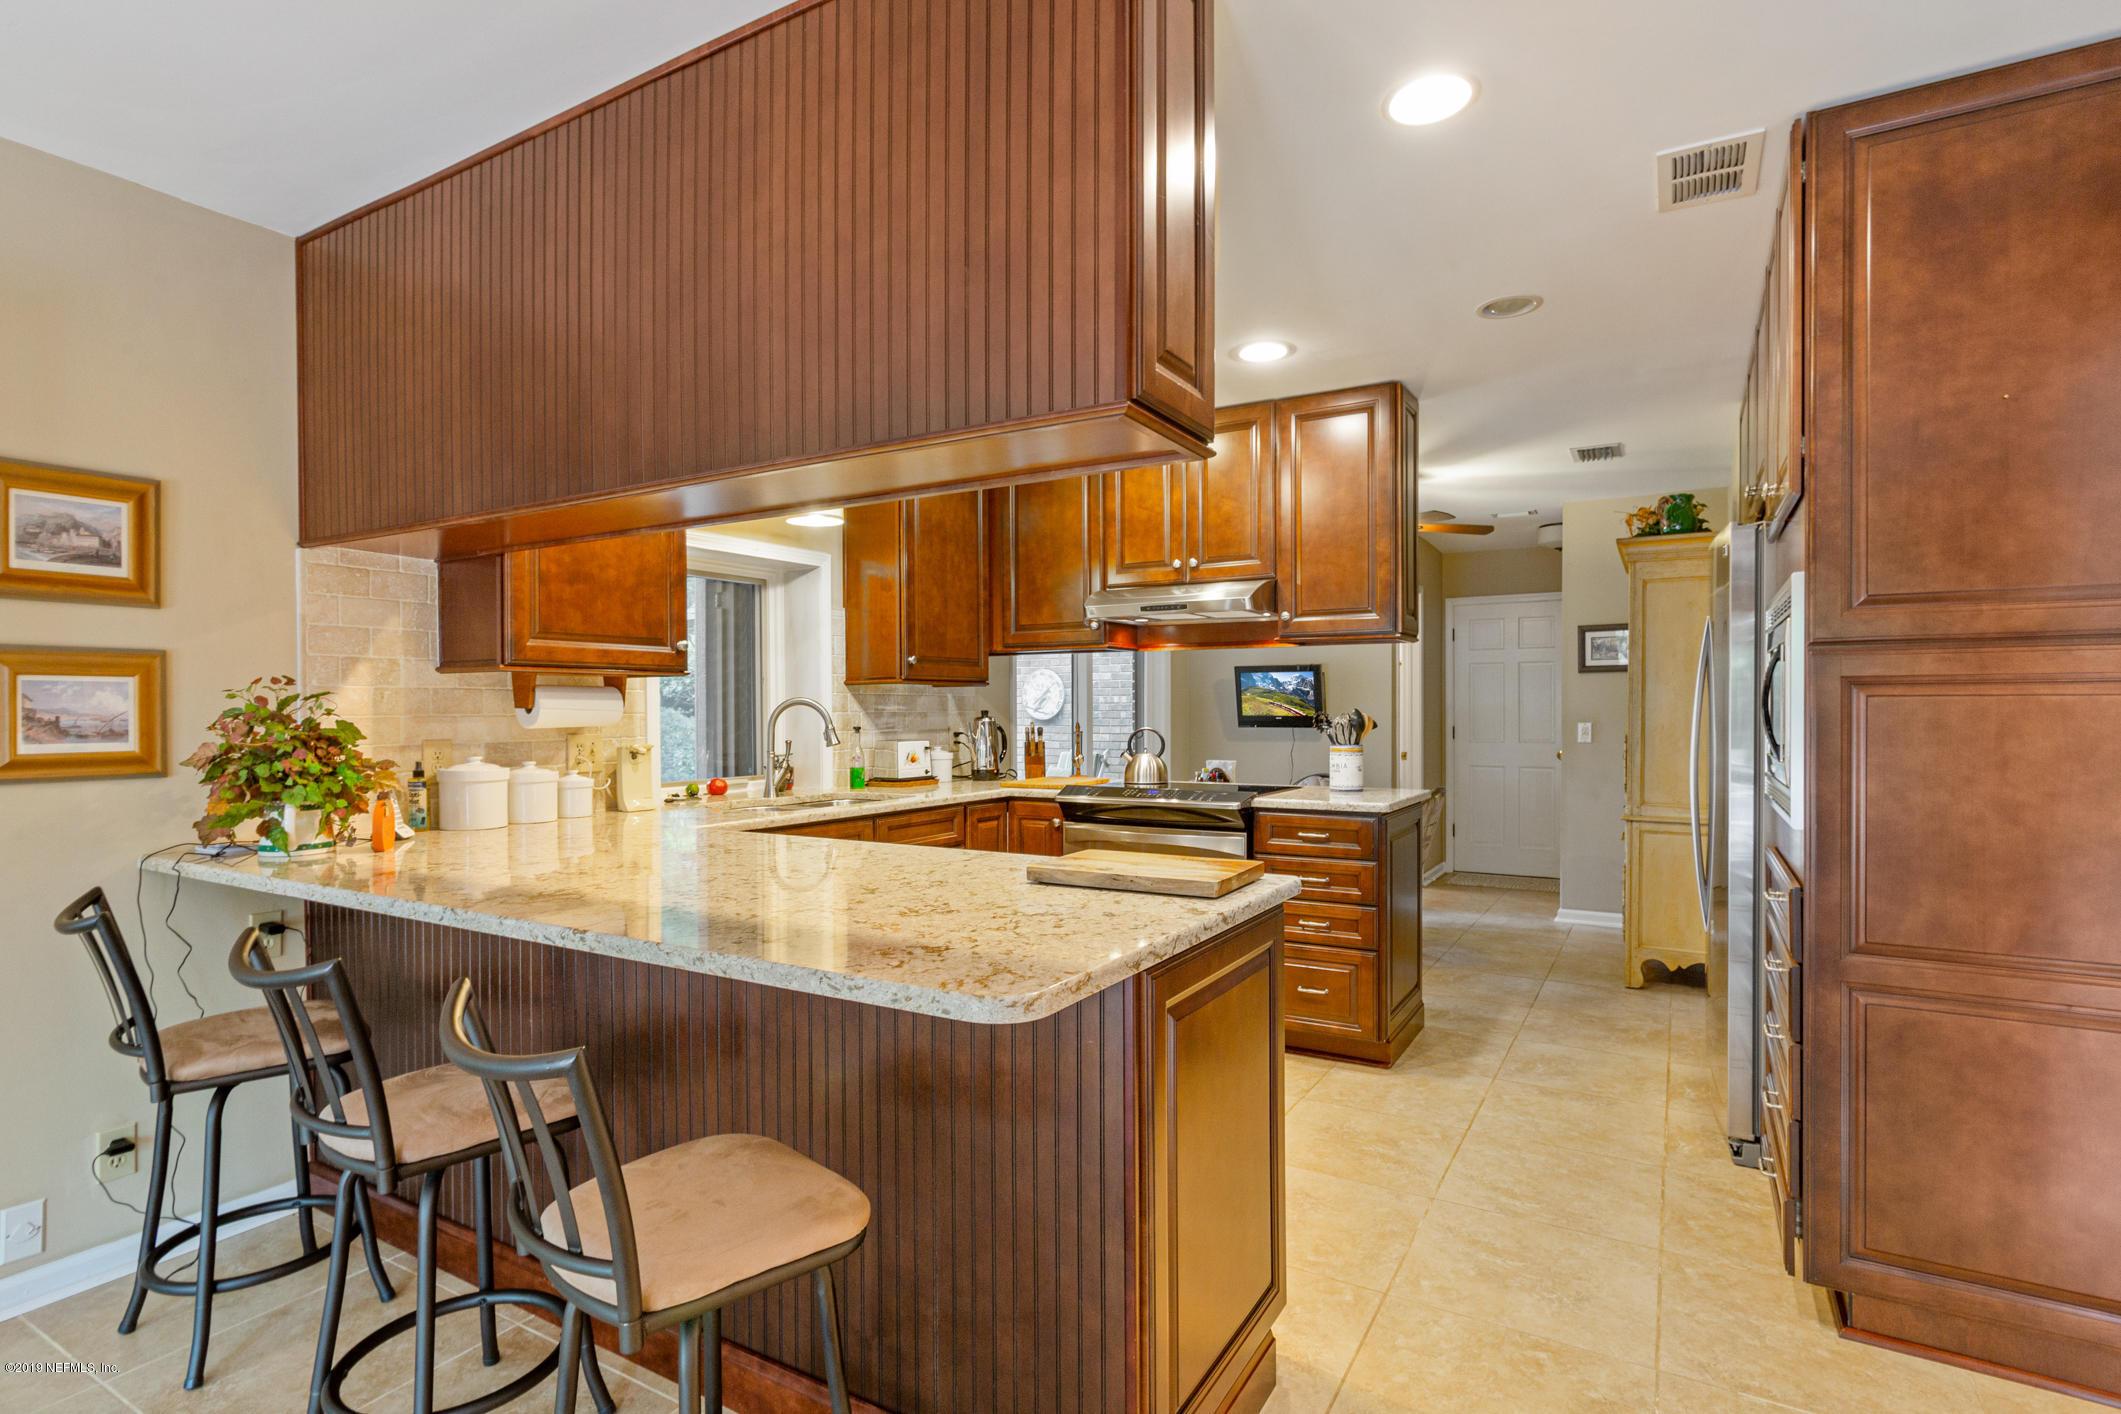 277 LAKE ASBURY, GREEN COVE SPRINGS, FLORIDA 32043, 3 Bedrooms Bedrooms, ,2 BathroomsBathrooms,Residential - single family,For sale,LAKE ASBURY,1022666